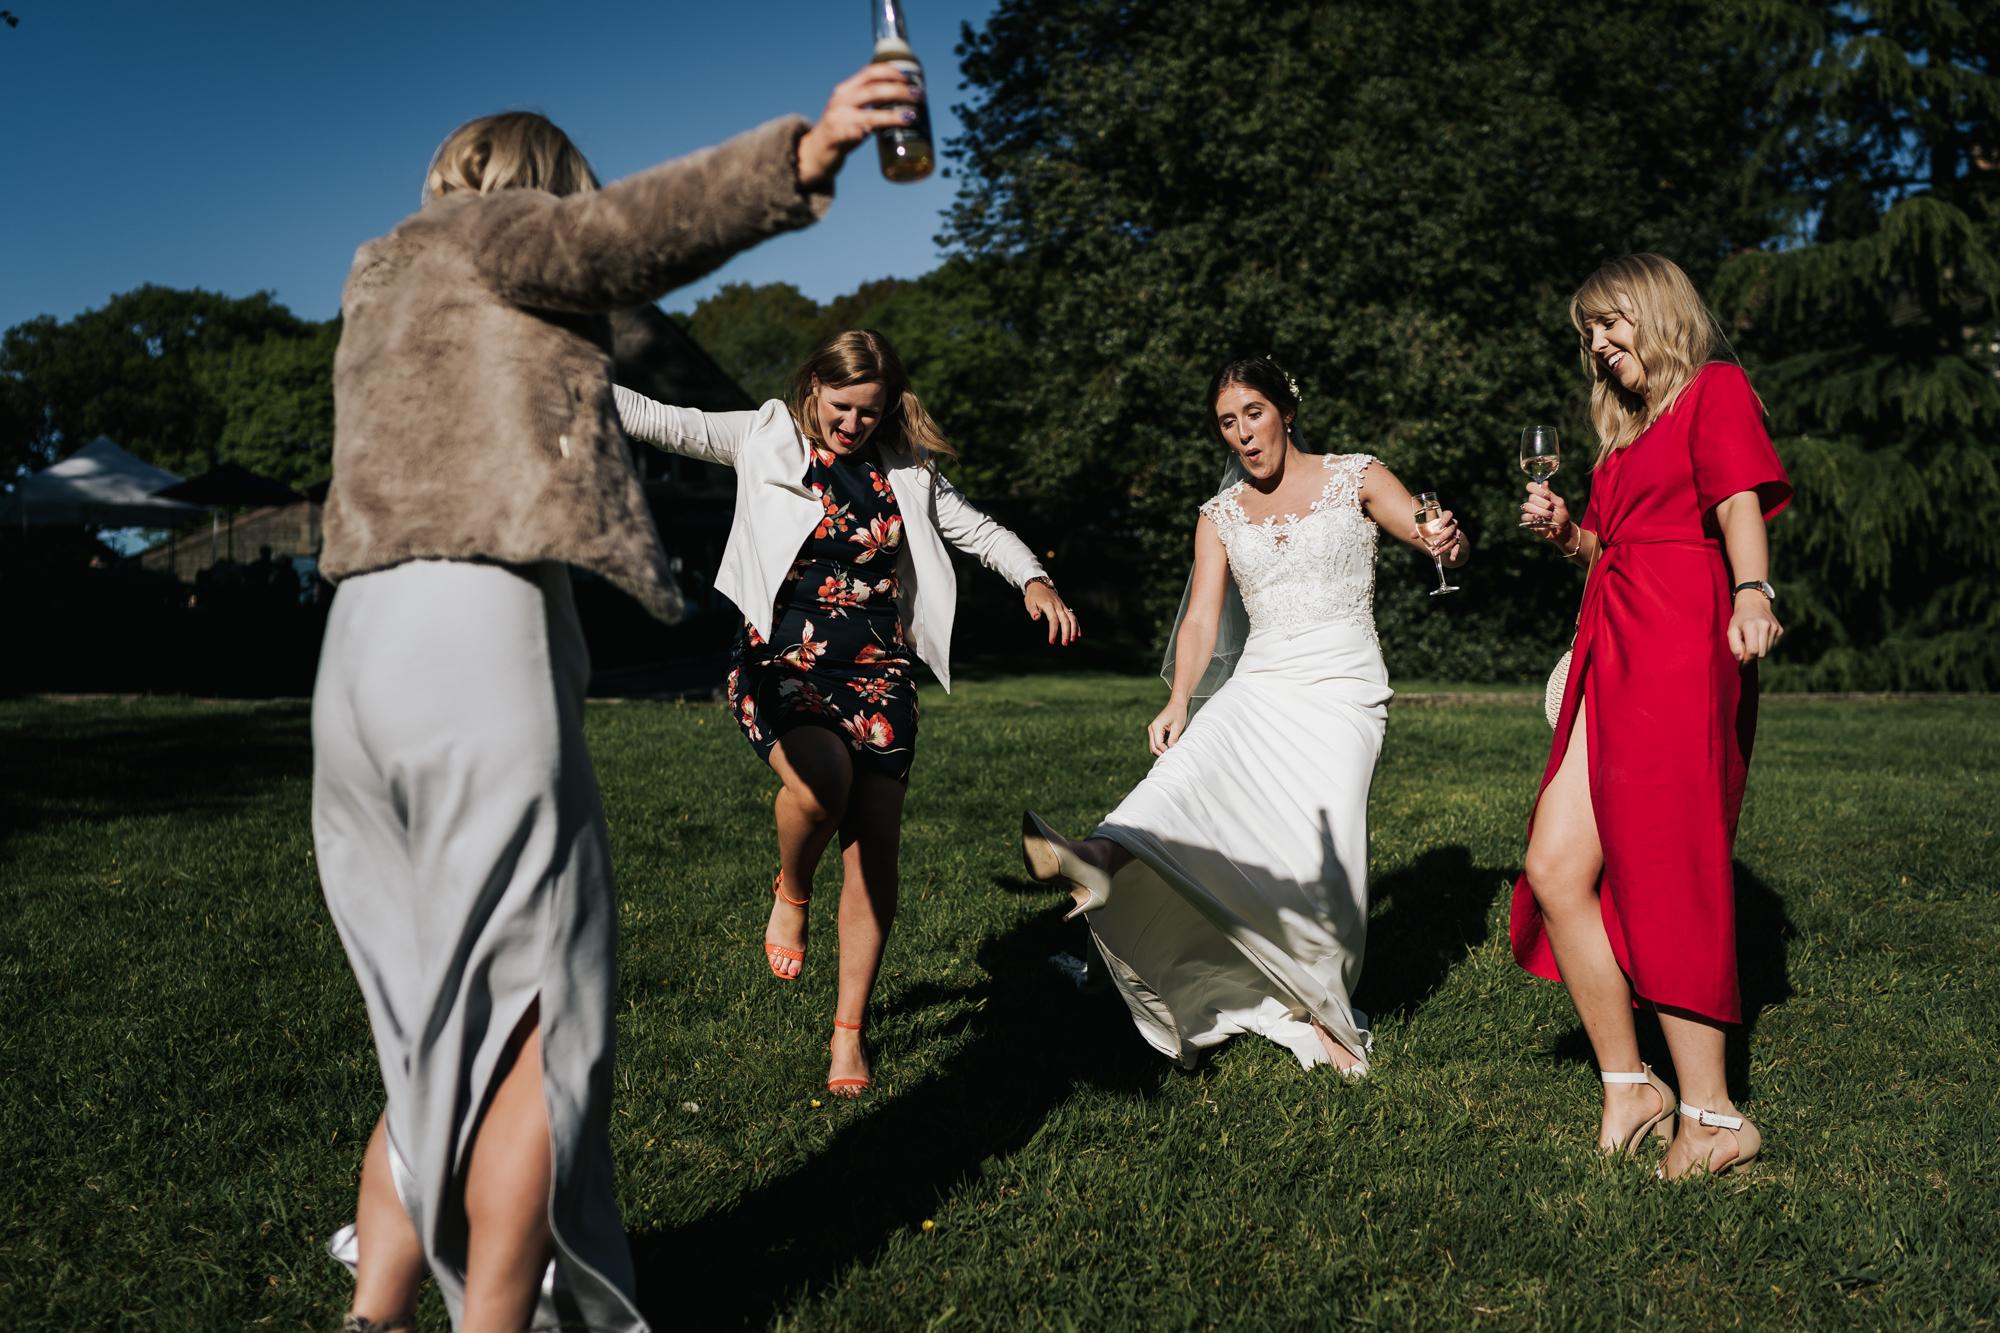 Rivington Hall Barn Wedding Photography lancashire wedding photographer (34 of 45).jpg